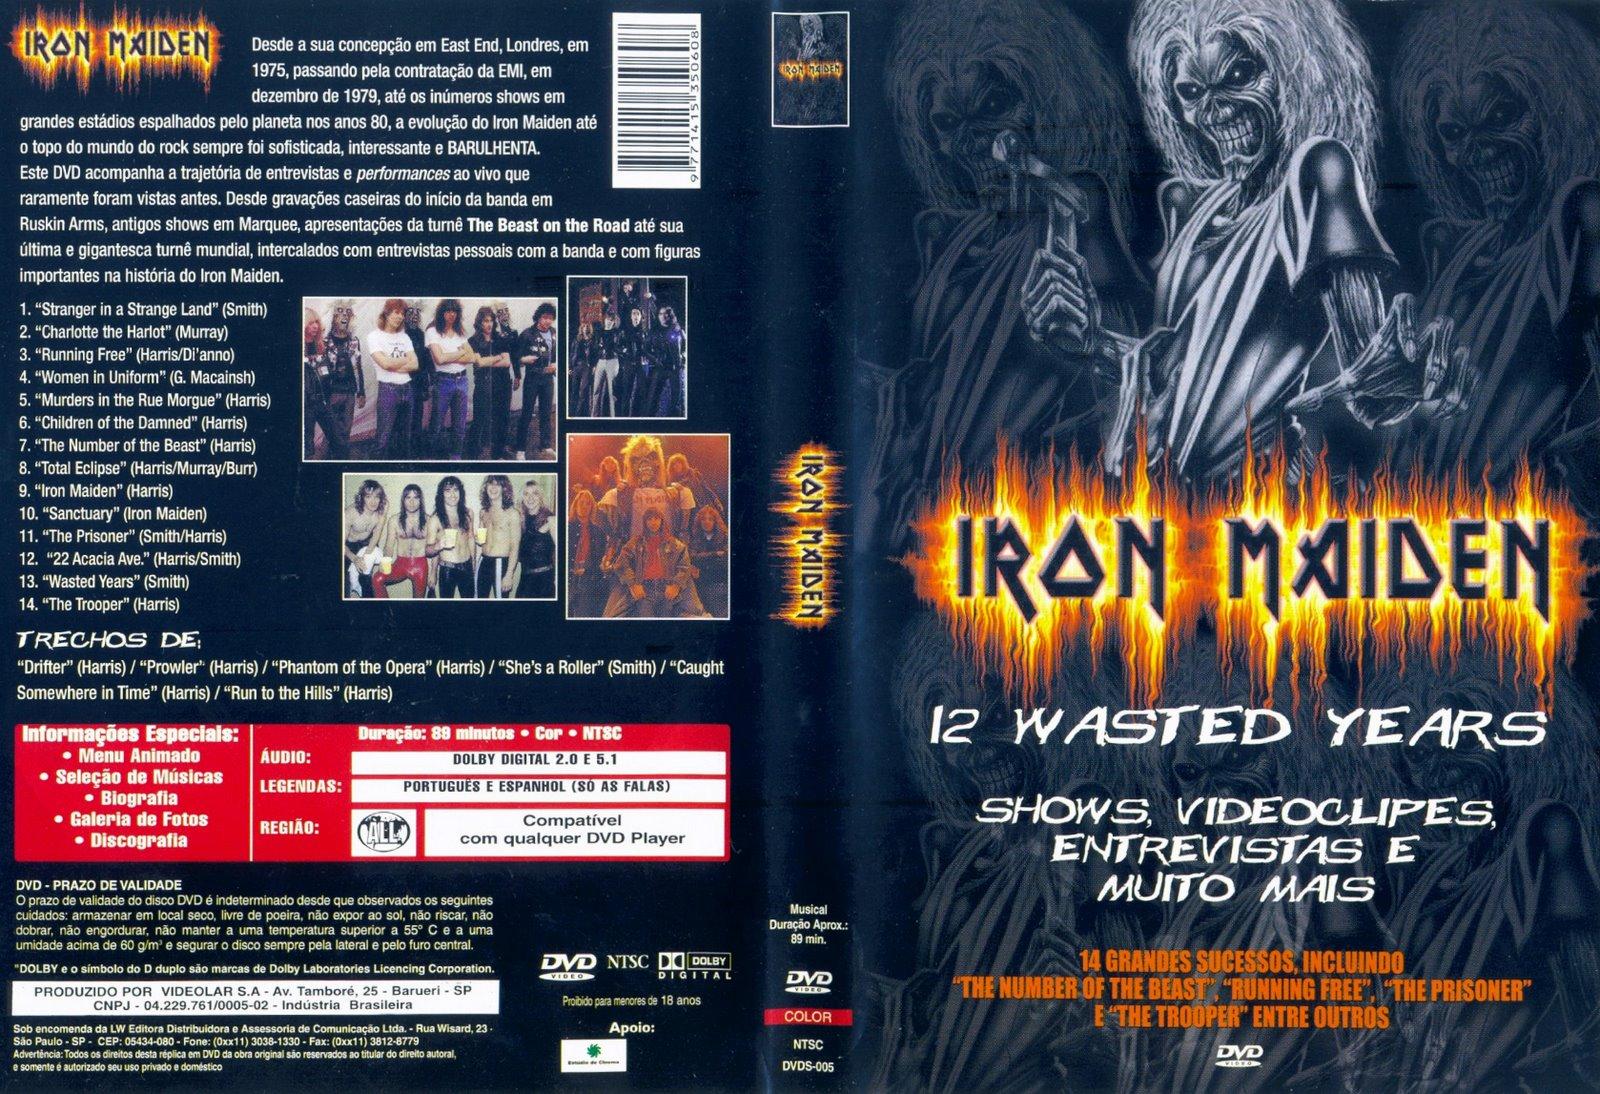 http://3.bp.blogspot.com/_brcl7Spzbn4/TJDPJJnQoLI/AAAAAAAAAjc/7RUdPVRsRqk/s1600/Iron+Maiden+-+12+Wasted+Years.jpg